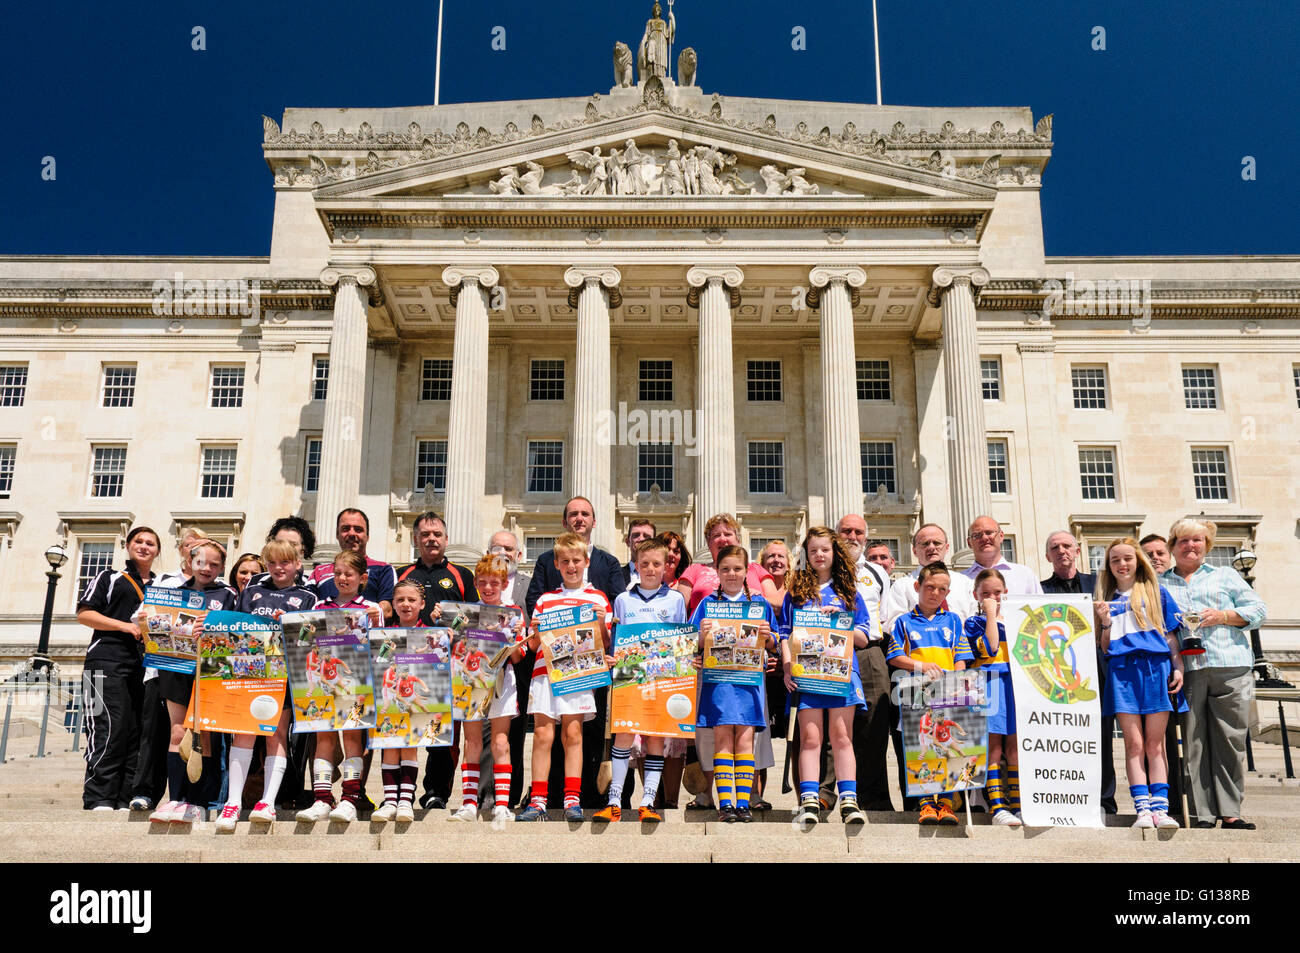 Antrim Camogie team help Sinn Fein launche the 2011 Poc ar an Cnoc at Stormont Parliament Buildings - Stock Image